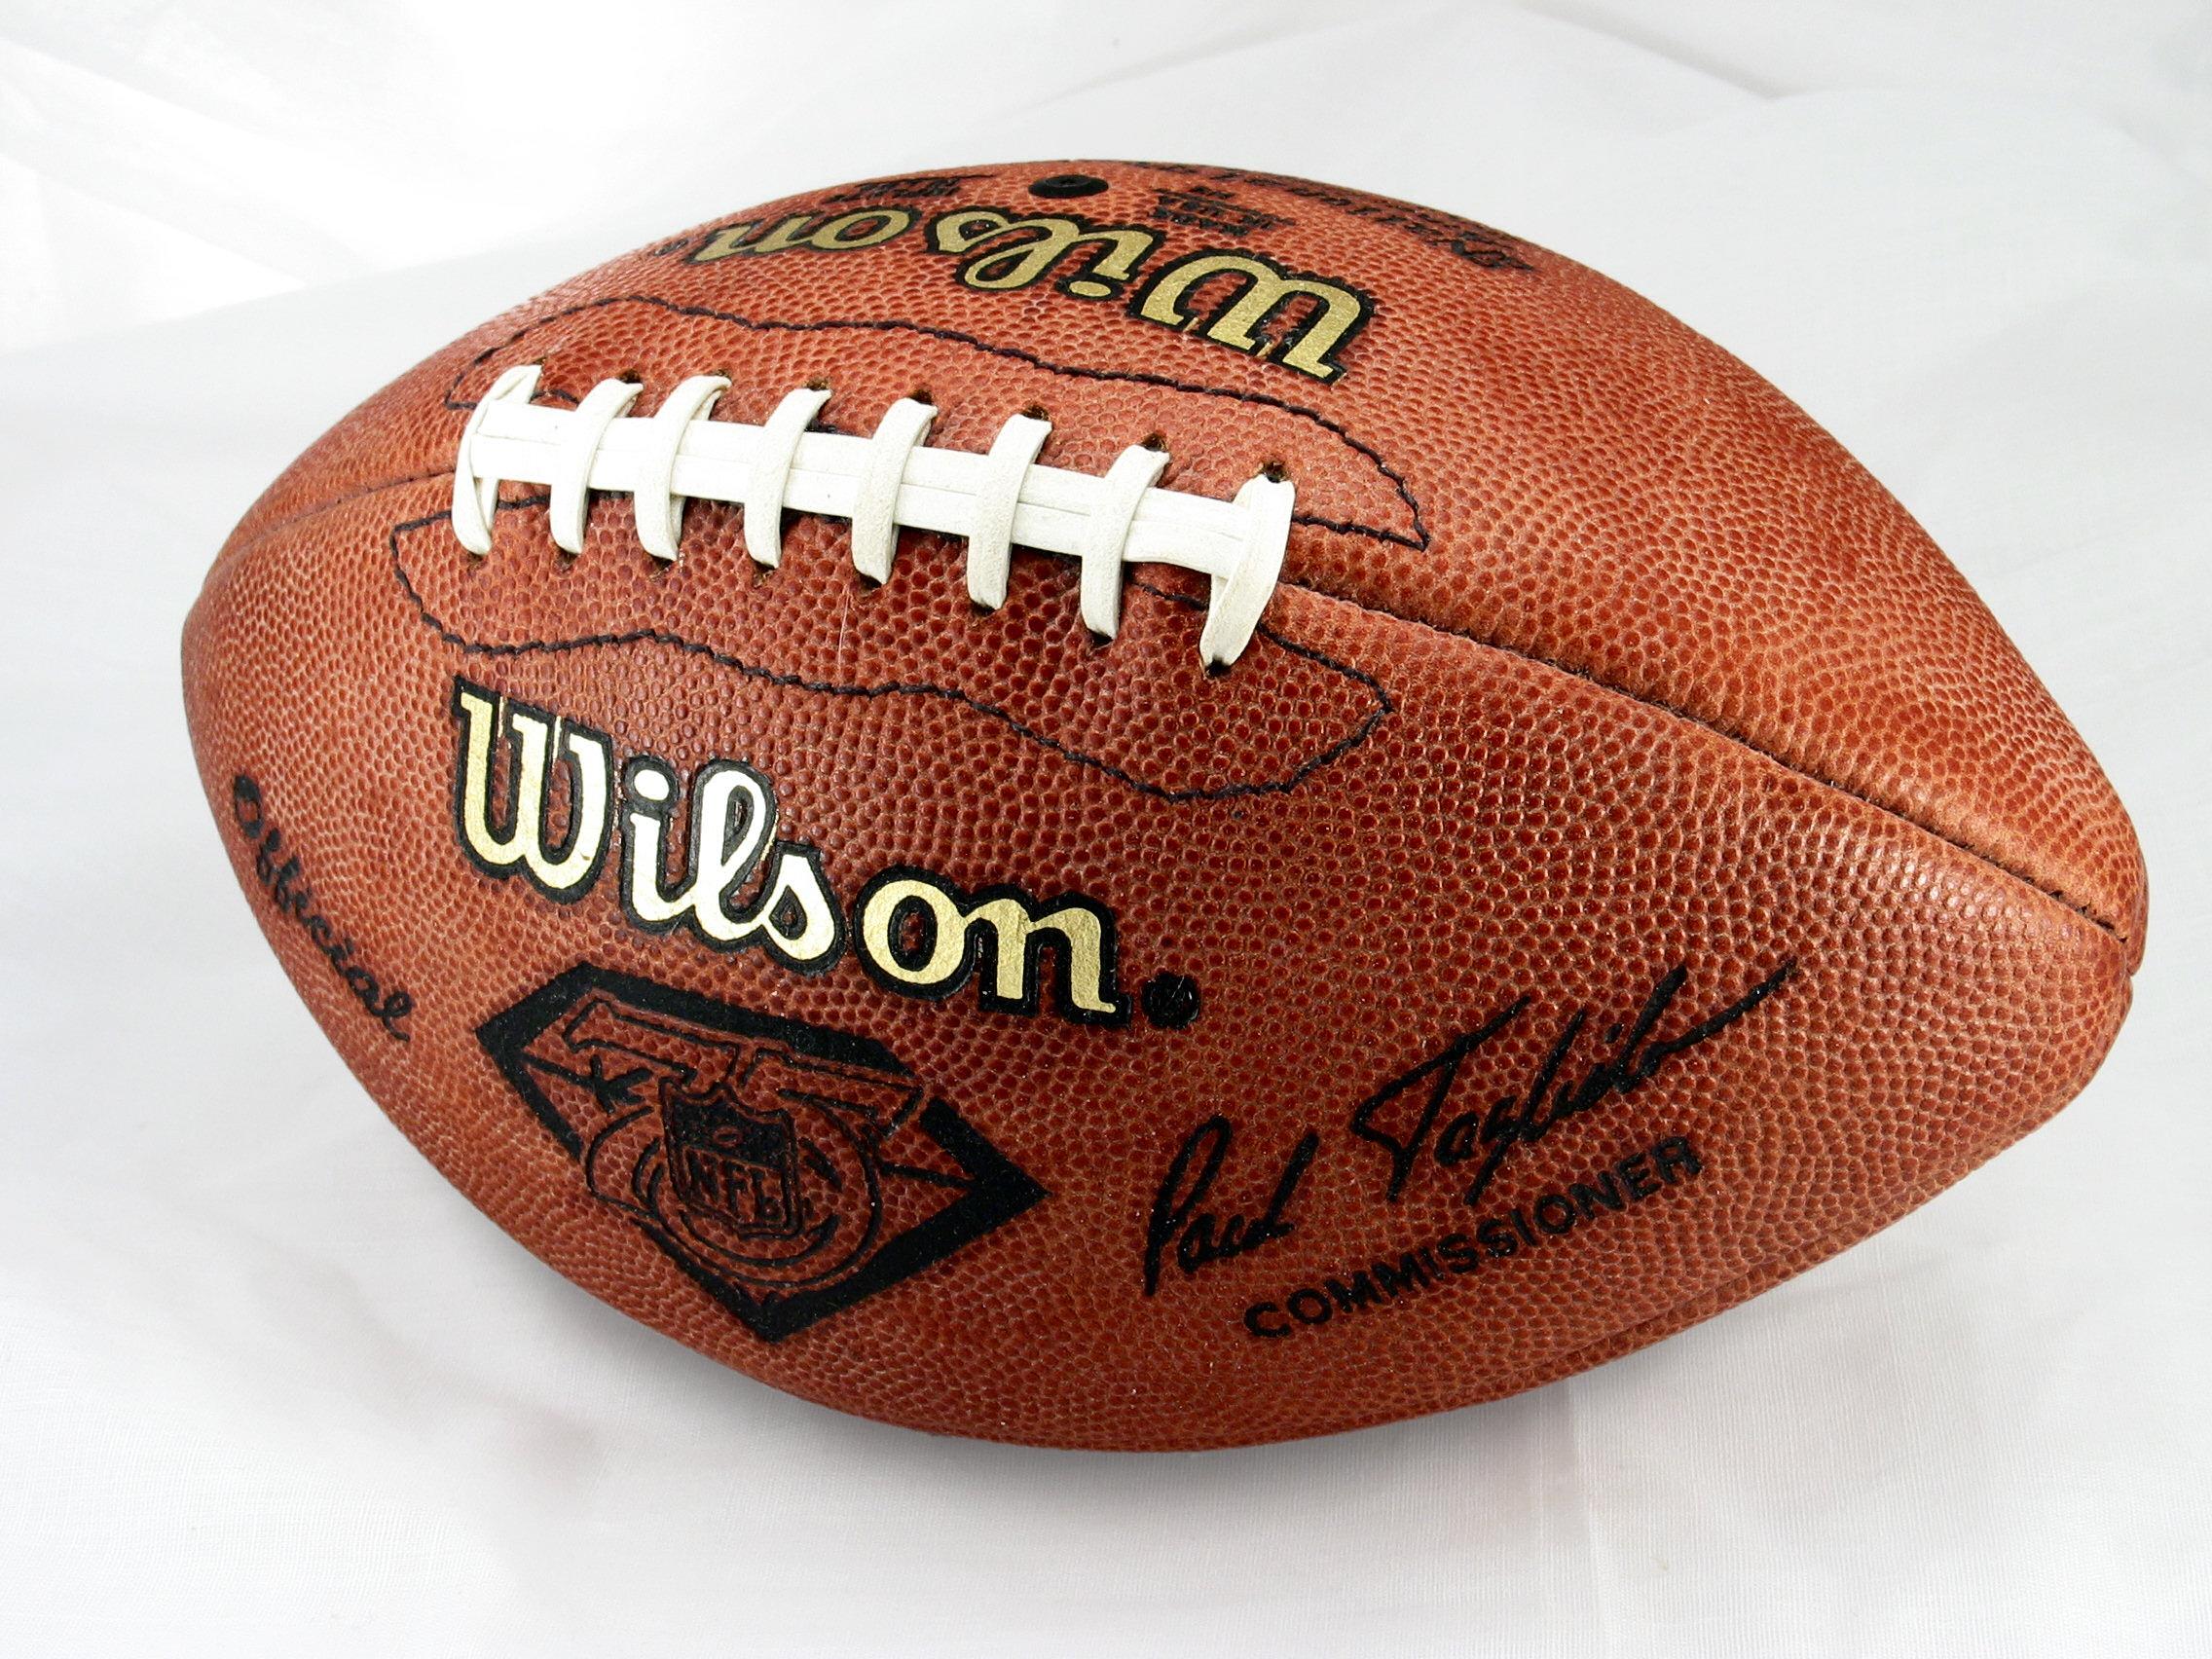 Wilson_American_football1.jpg